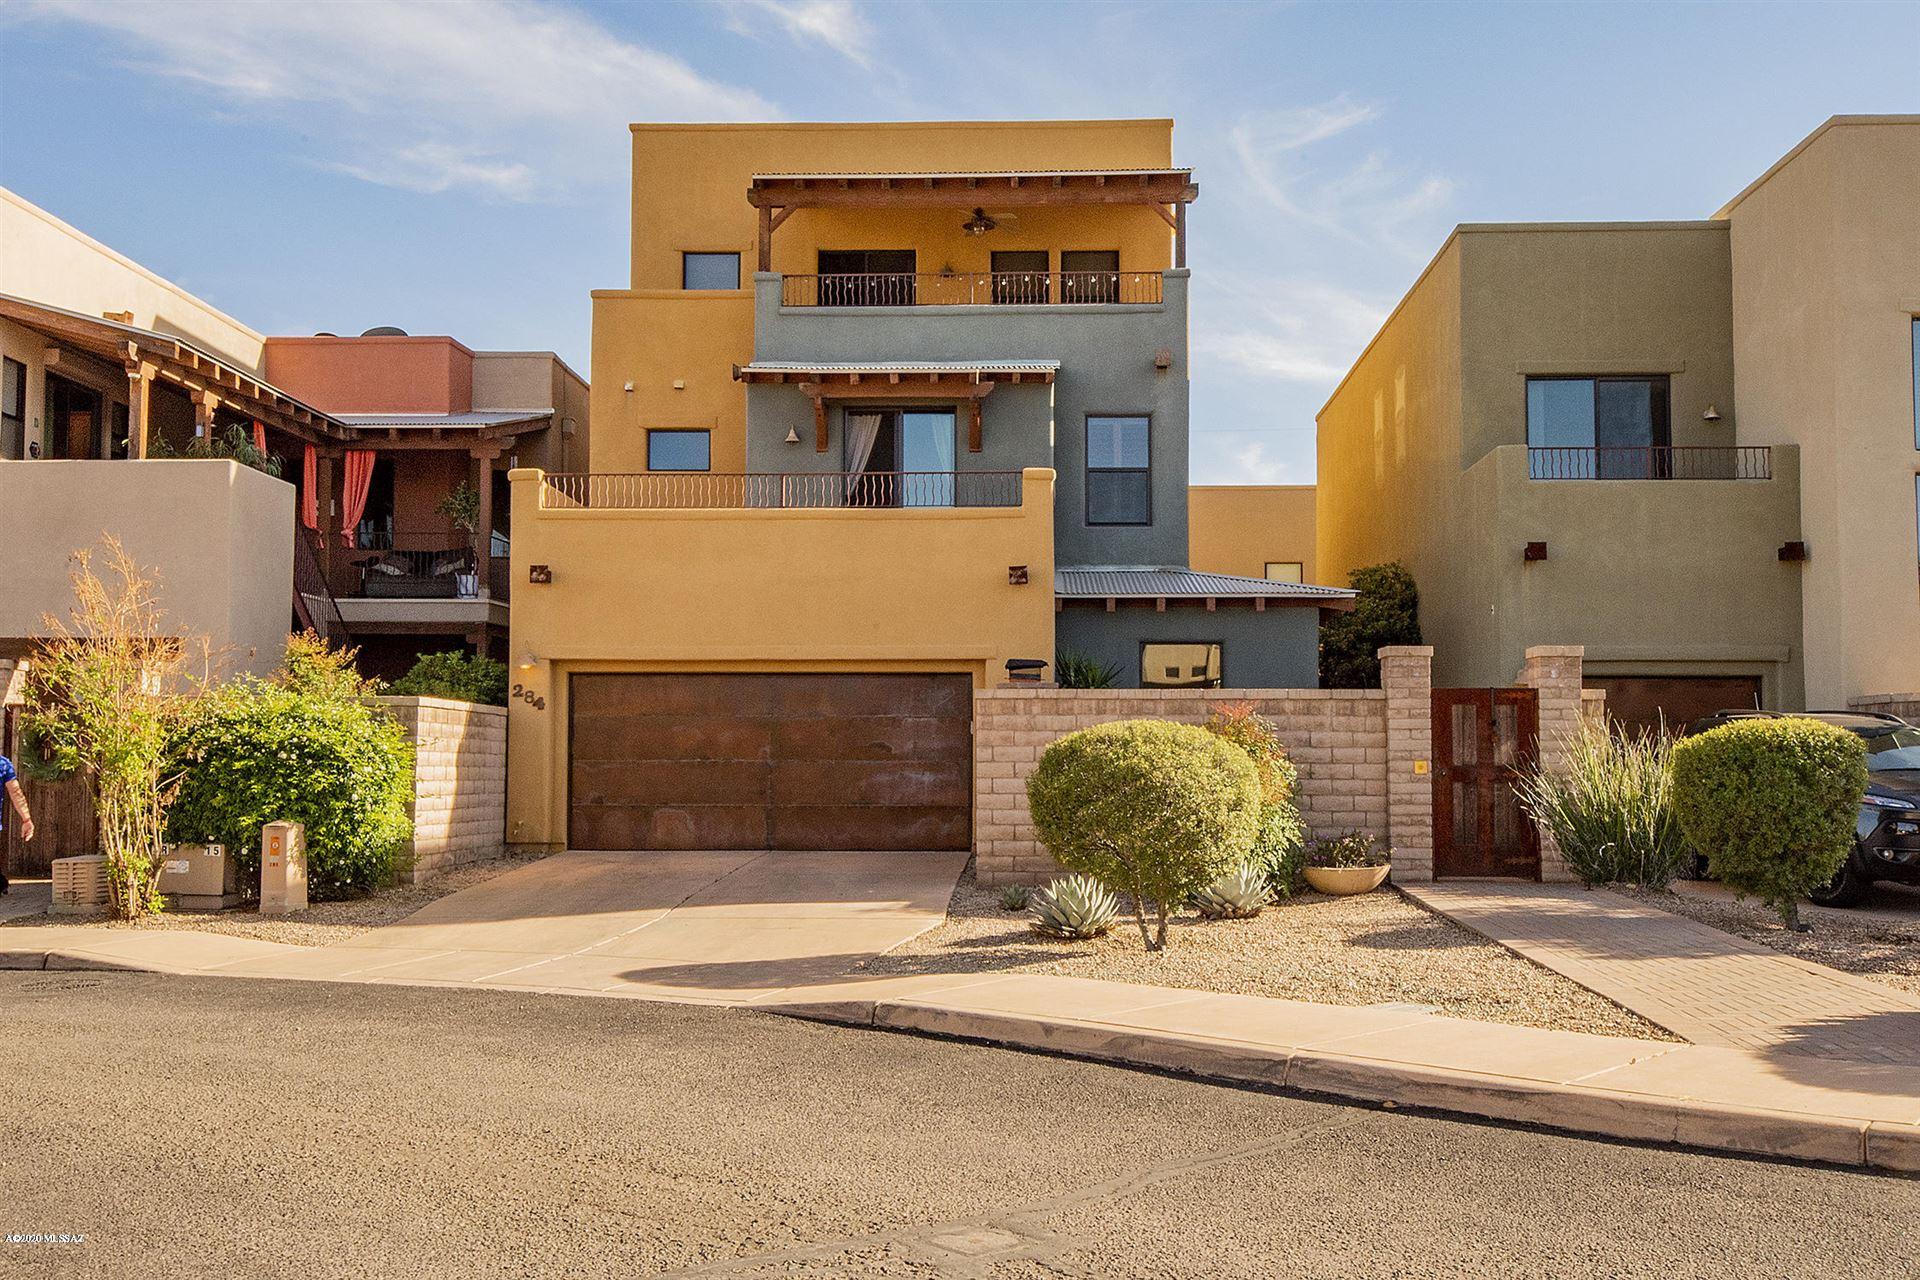 284 E Cedarvale Road, Tucson, AZ 85704 - MLS#: 22008230